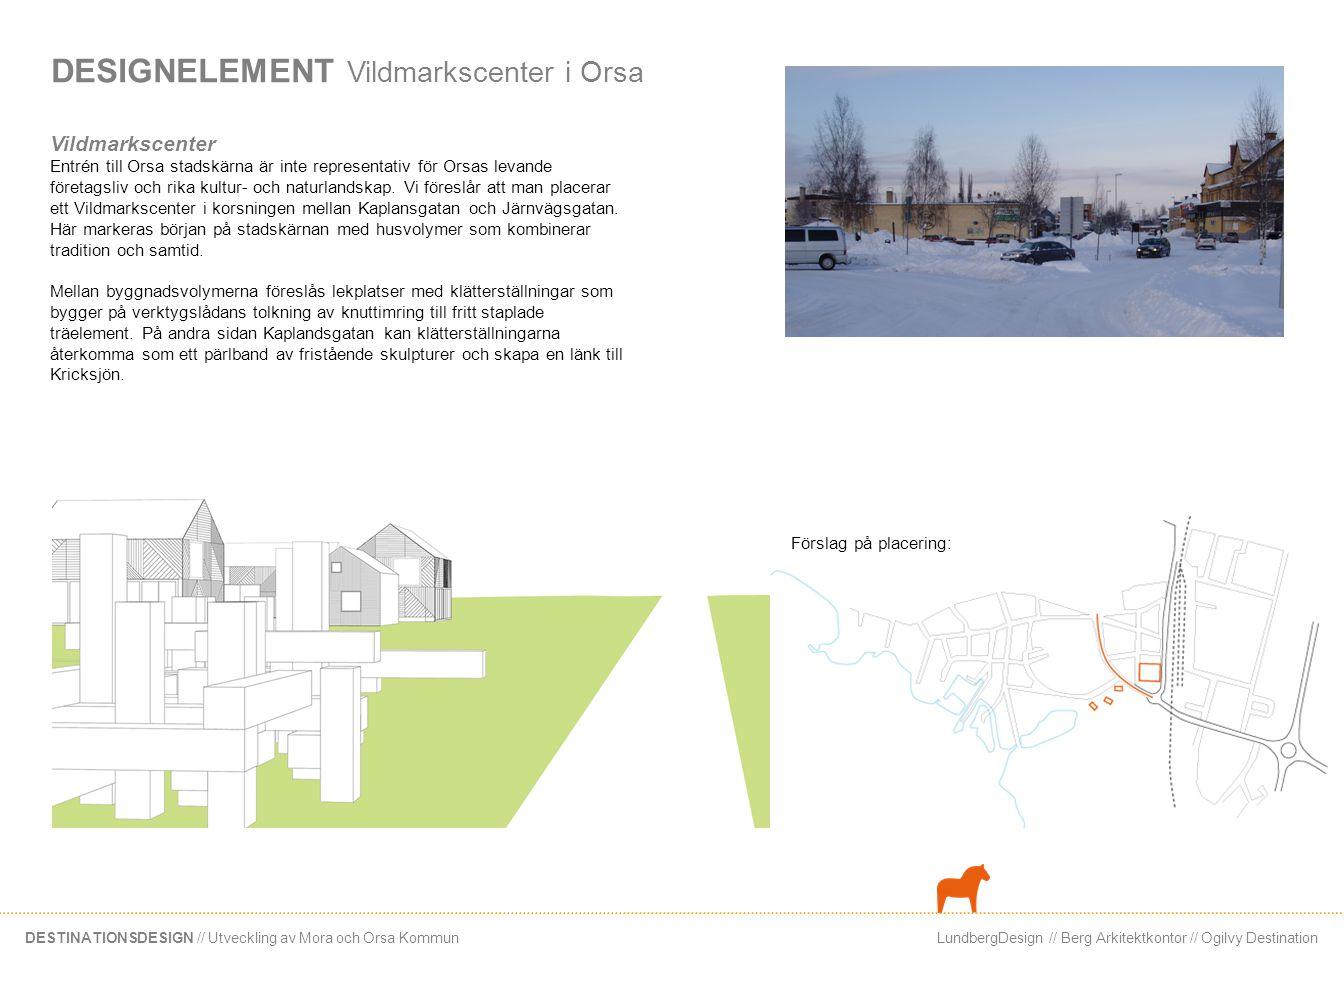 LundbergDesign // Berg Arkitektkontor // Ogilvy DestinationDESTINATIONSDESIGN // Utveckling av Mora och Orsa Kommun DESIGNELEMENT Vildmarkscenter i Or